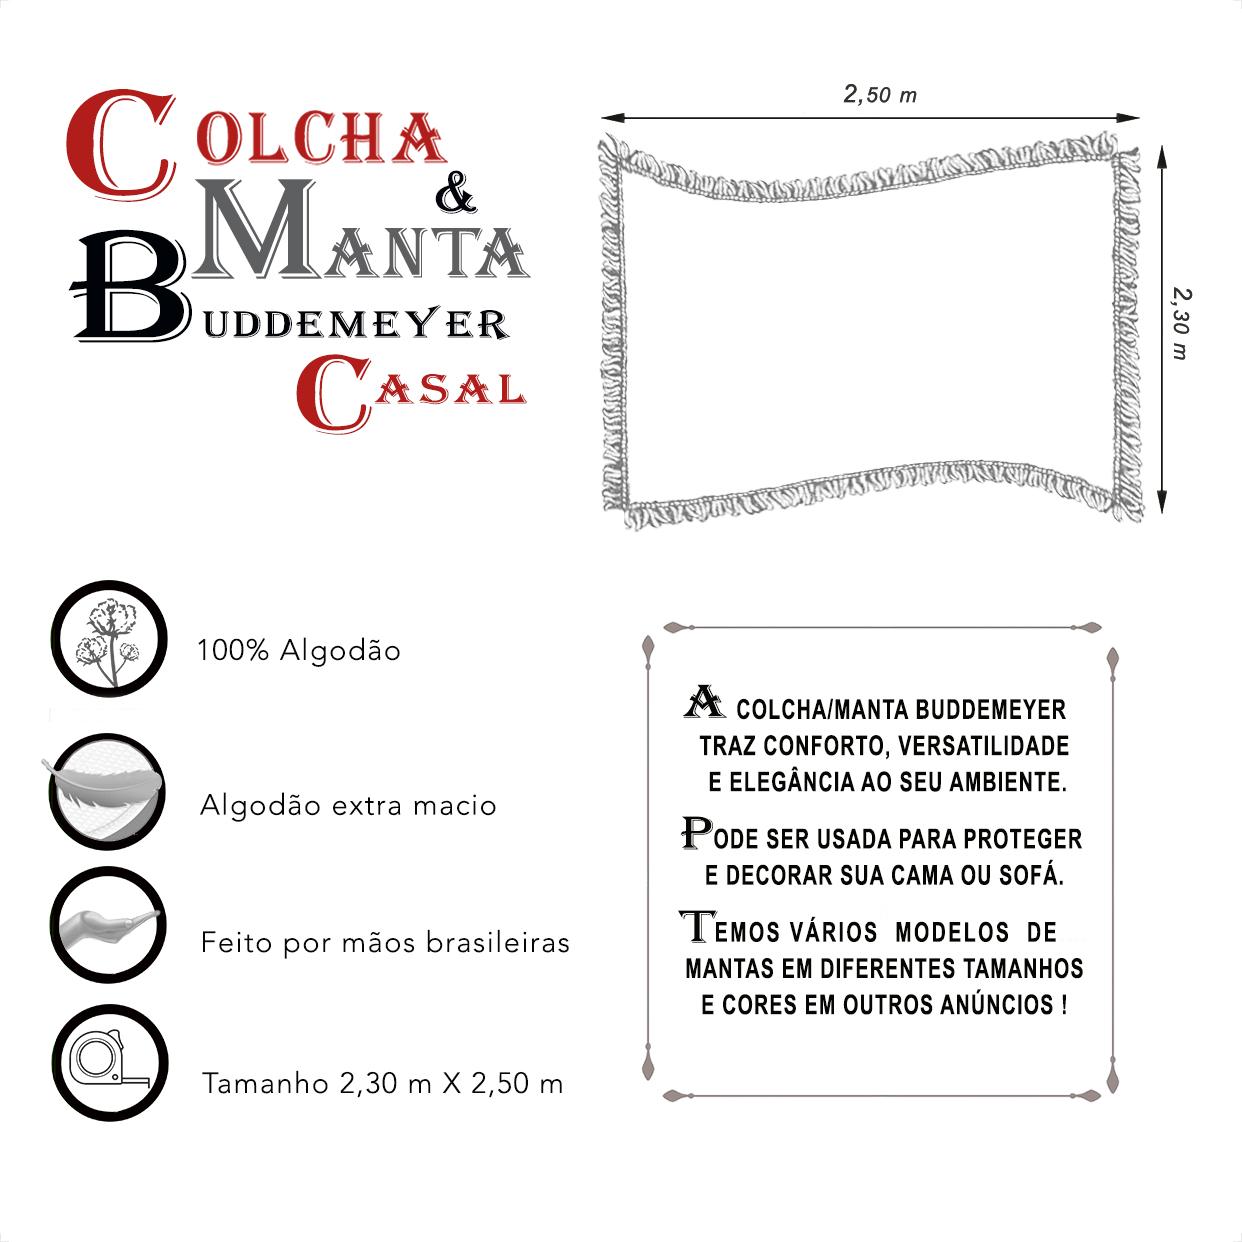 Manta e Colcha Buddemeyer Casal Telha 2,30m x 2,50m